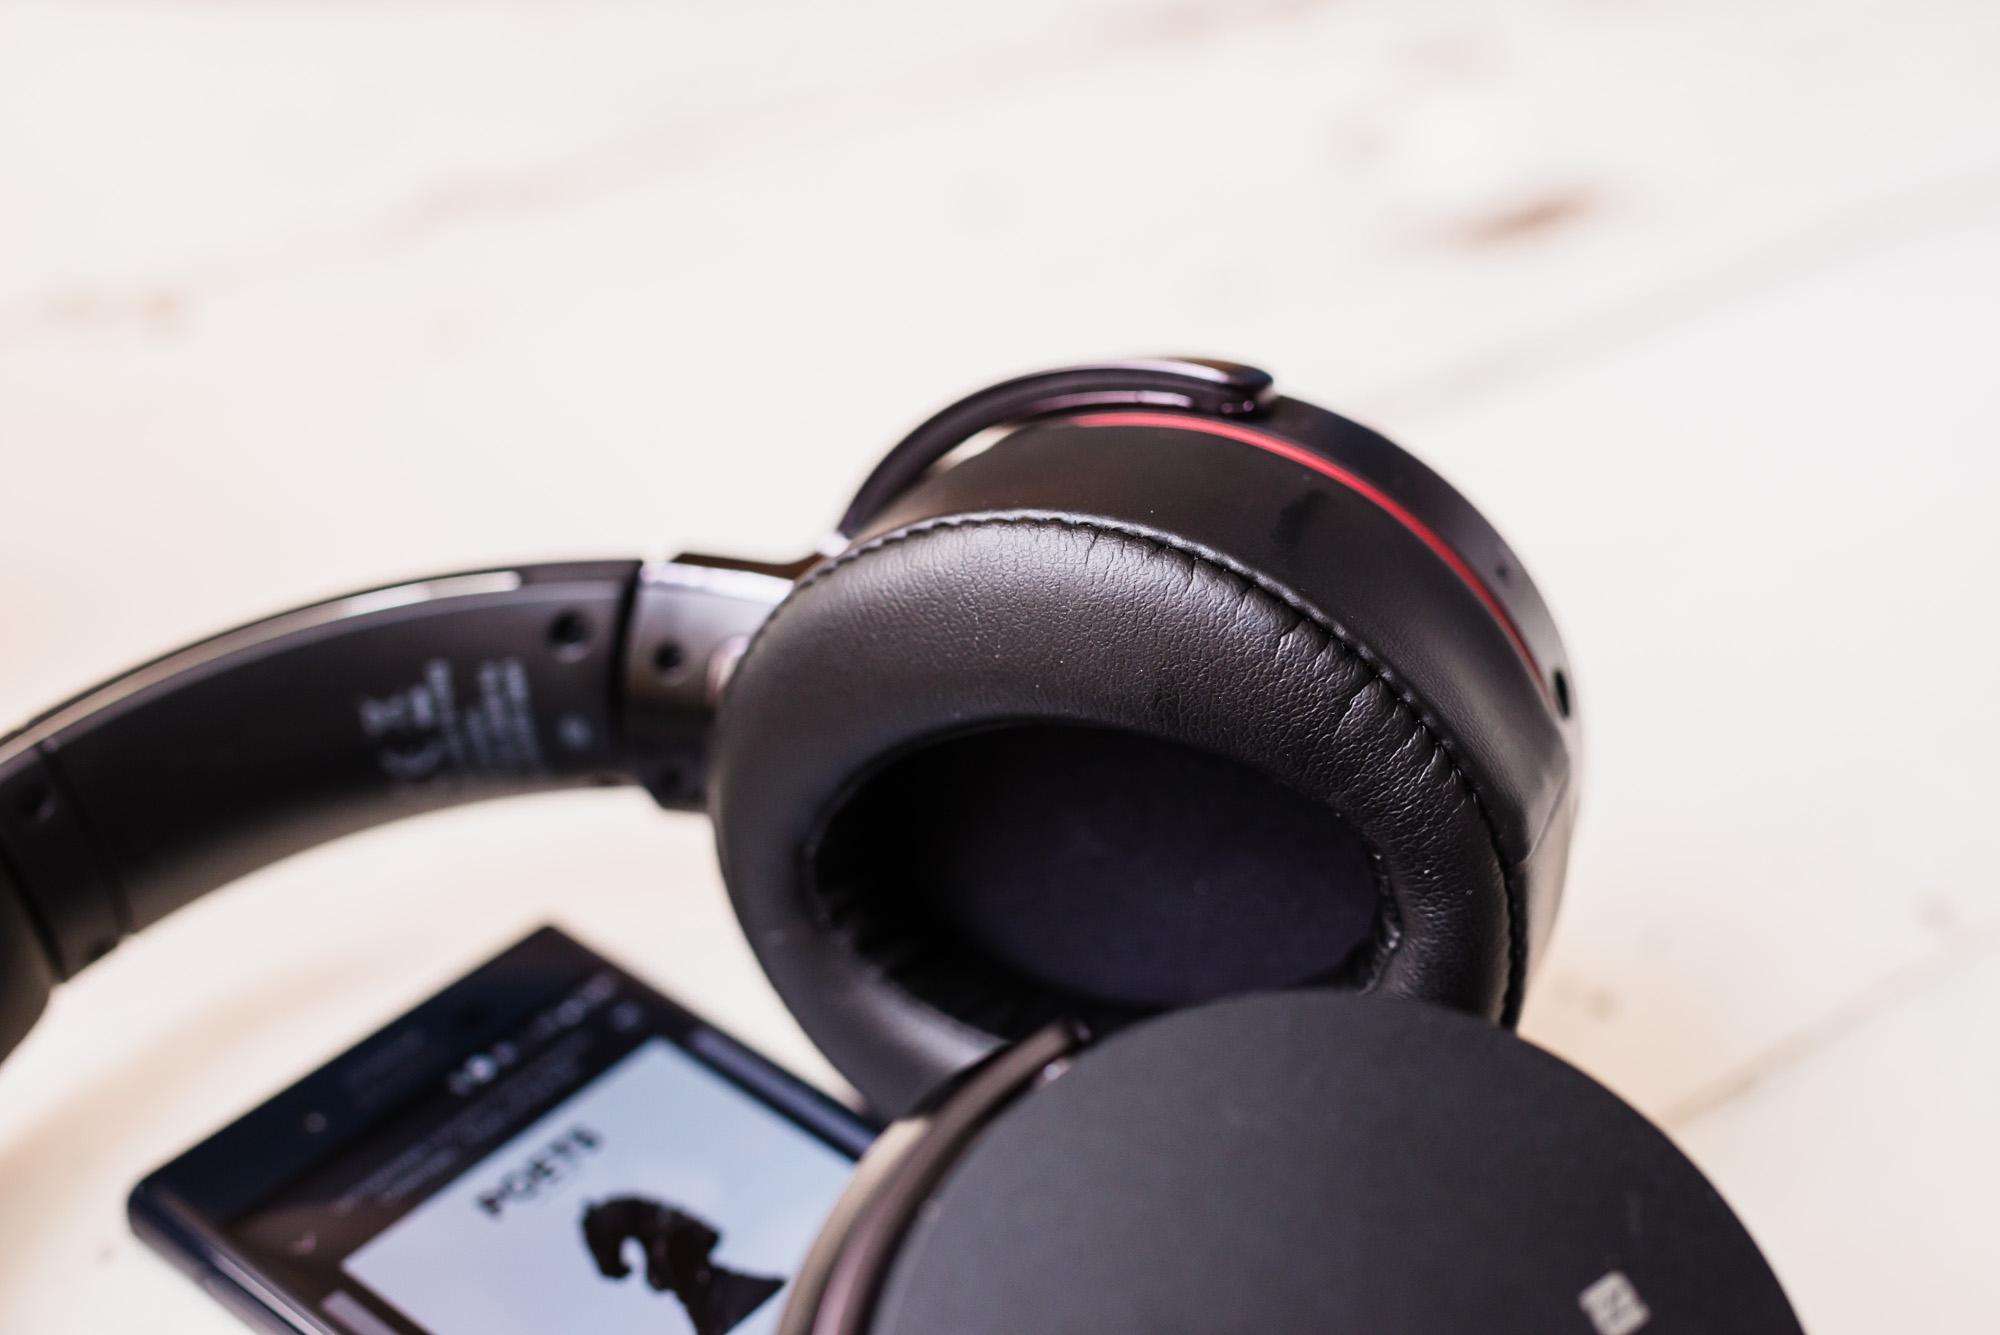 Sony Mdr Xb950bt Recenzja Spiders Web Xb650btr Red Extra Bass 10